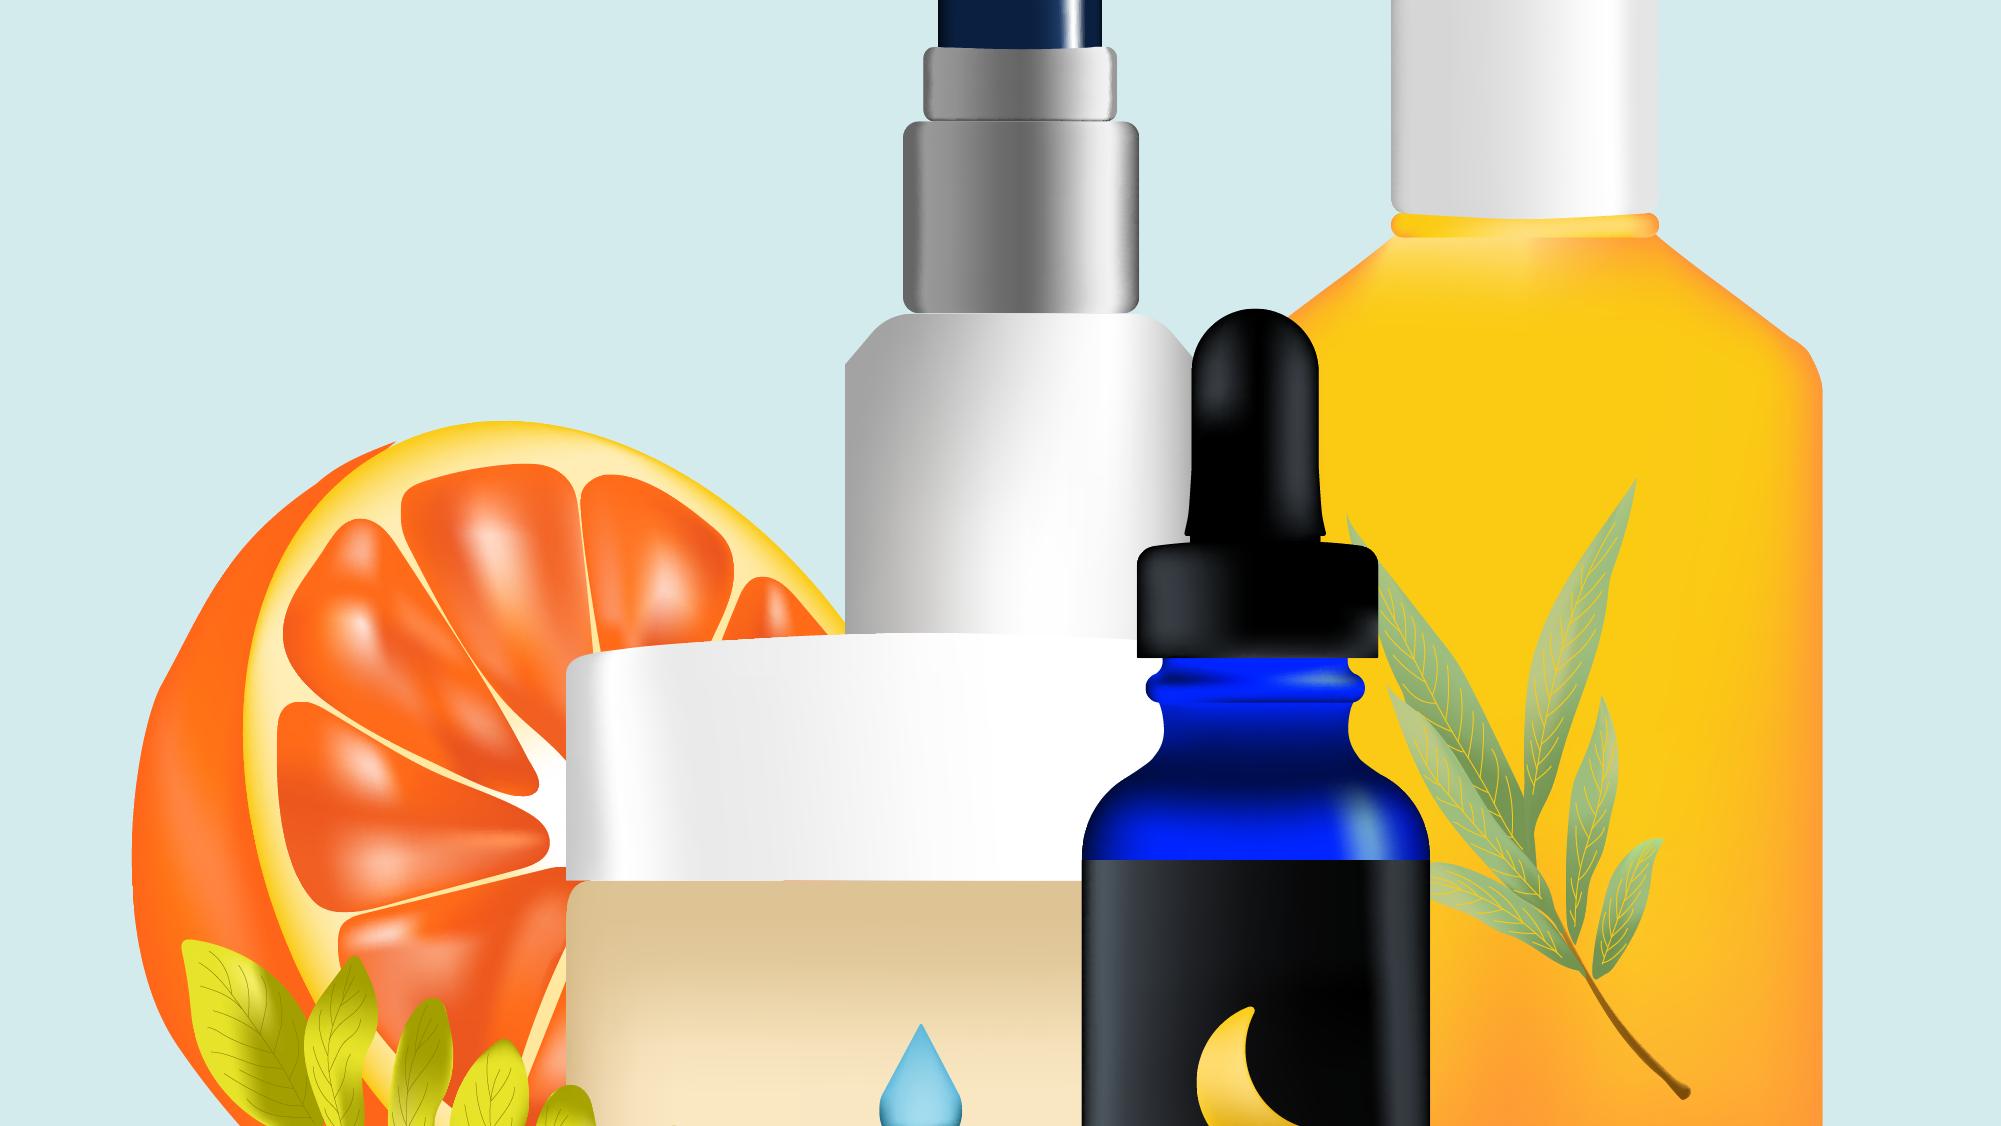 How To Use Vitamins Acids Skin Care Regimen Treatment in